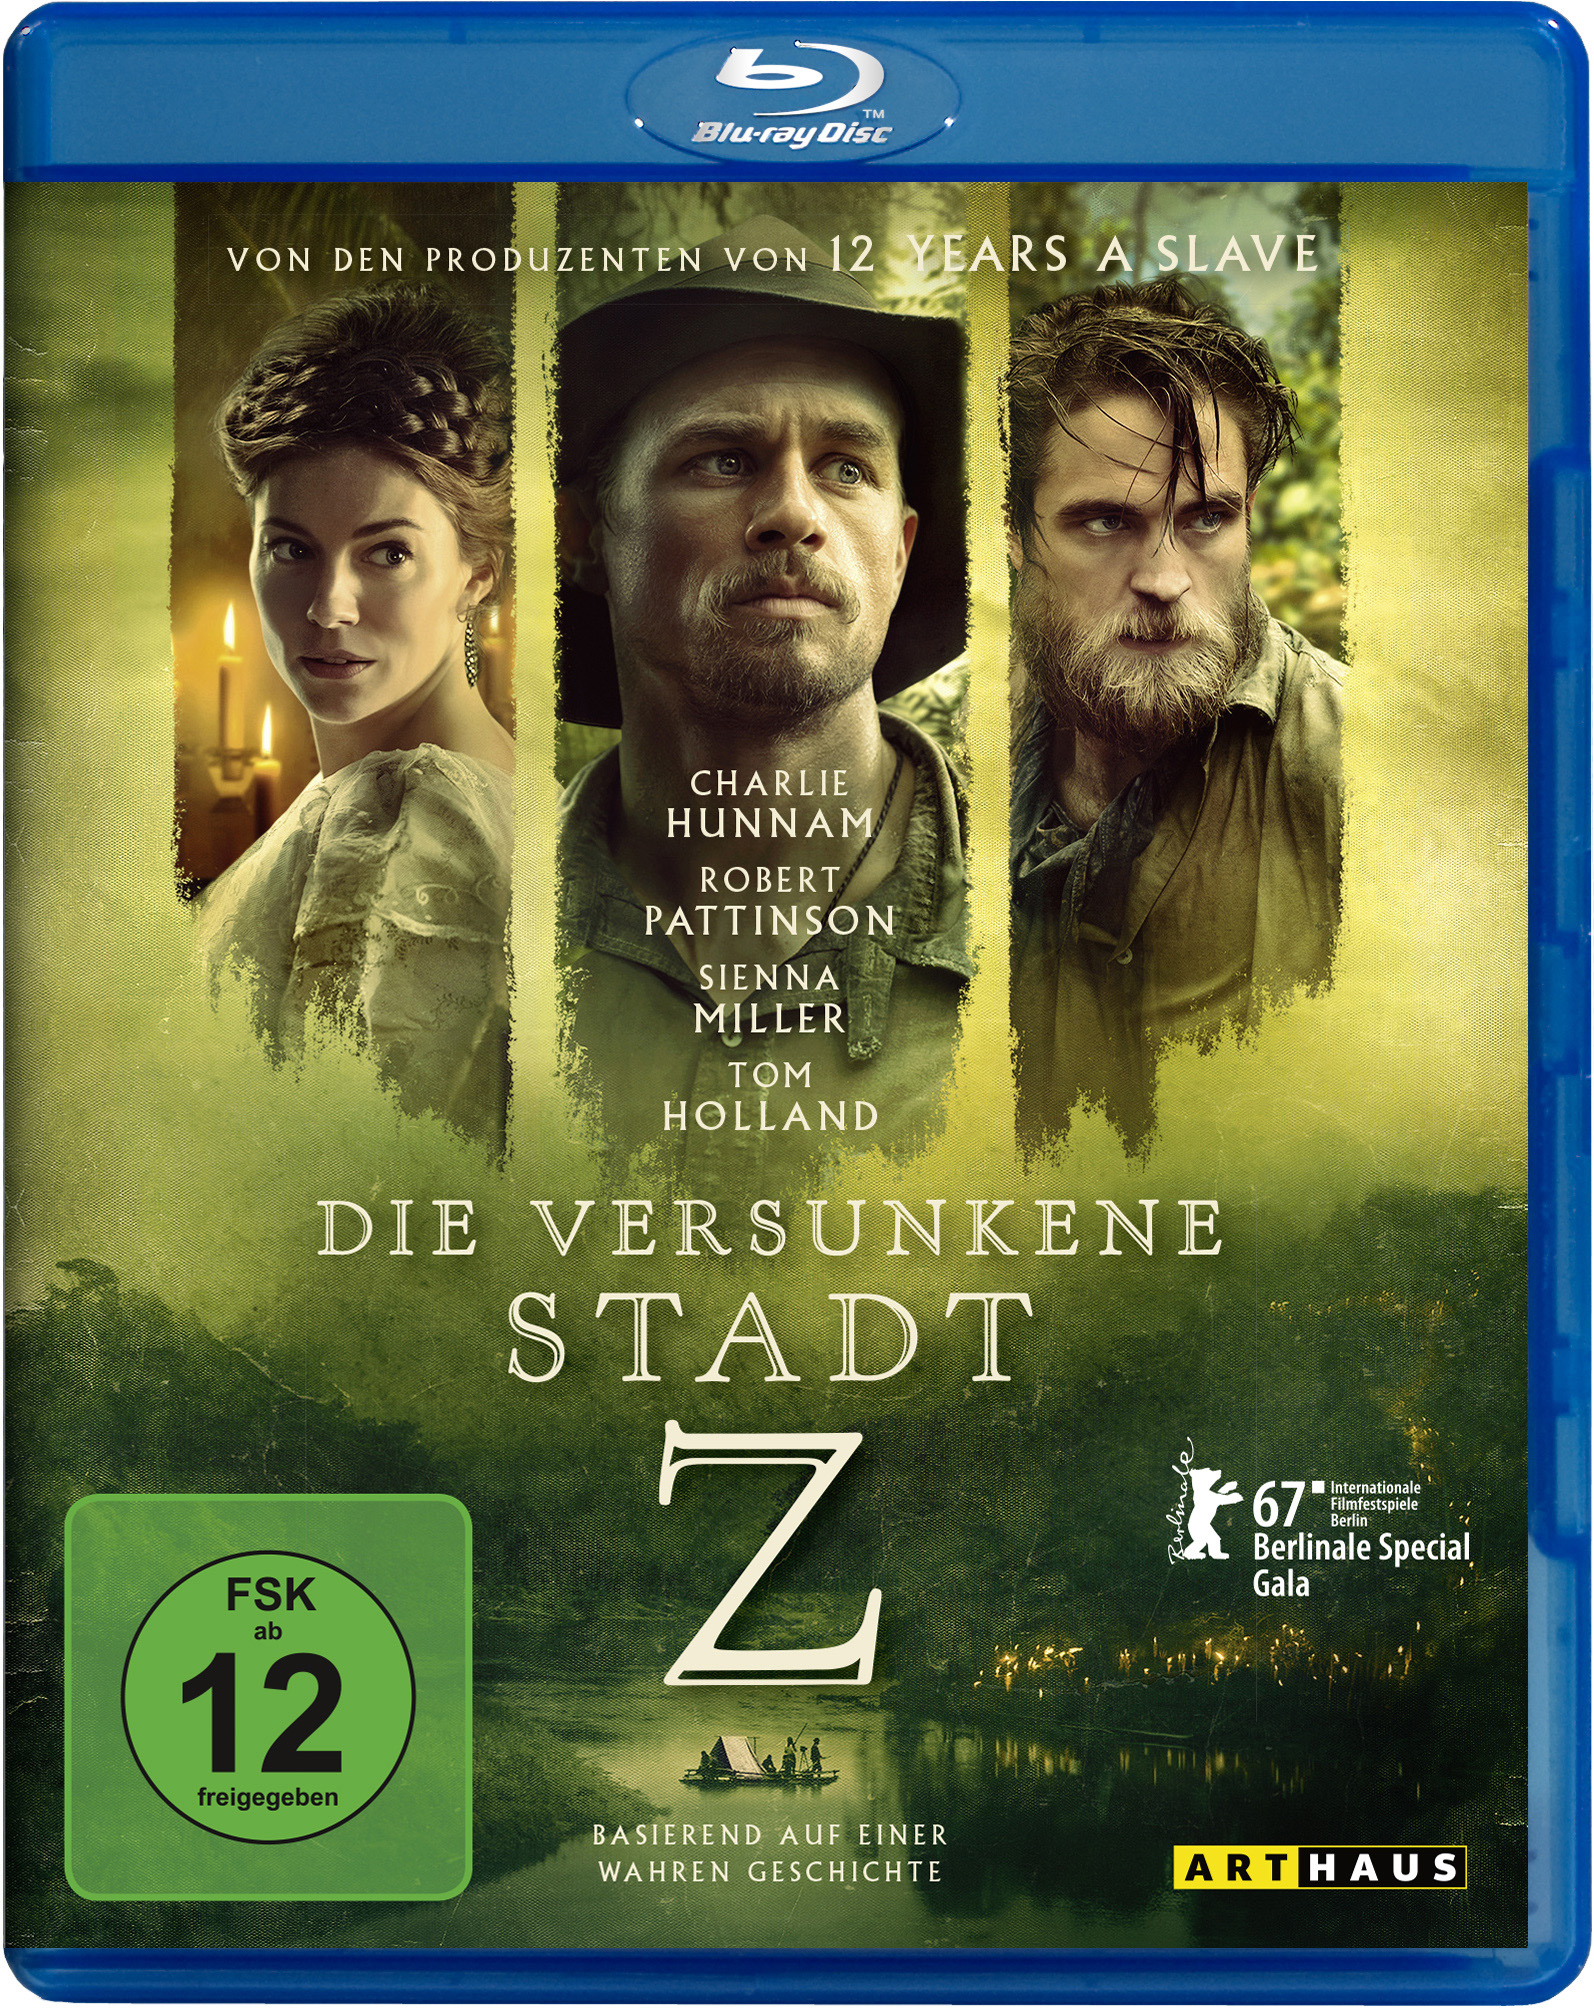 Die Versunkene Stadt Z Movie4k